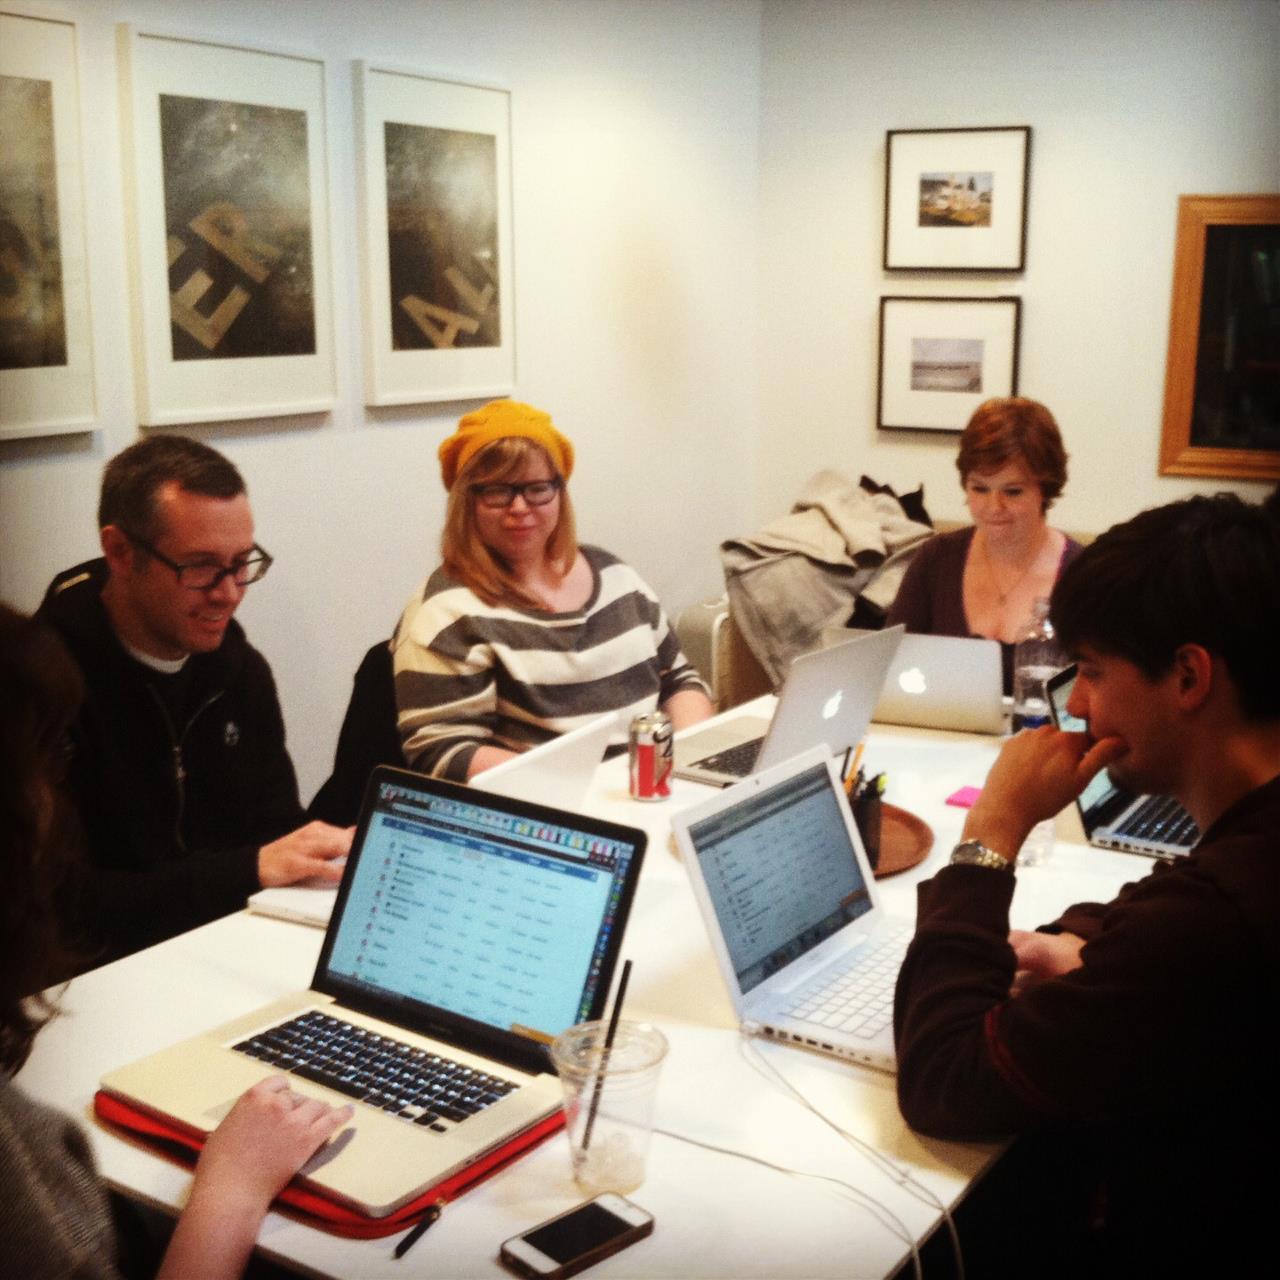 A Paper Darts staff meeting (via Paper Darts on Facebook).